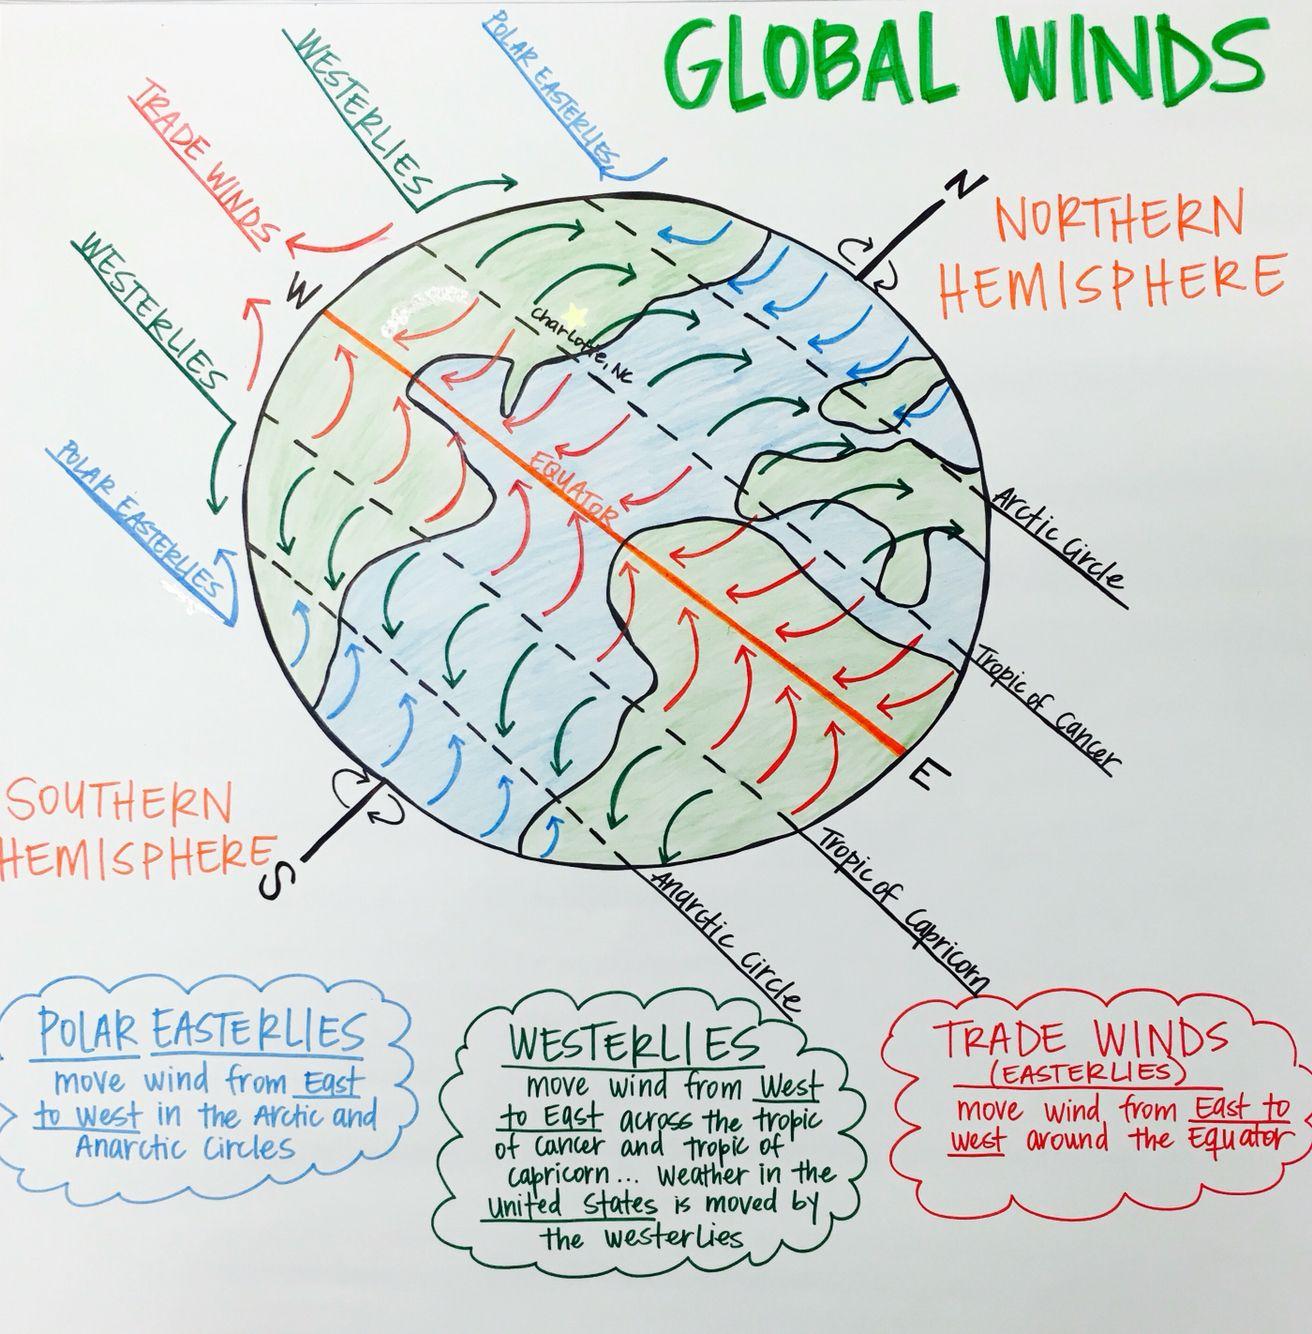 medium resolution of Global Winds Anchor Chart (Polar Easterlies